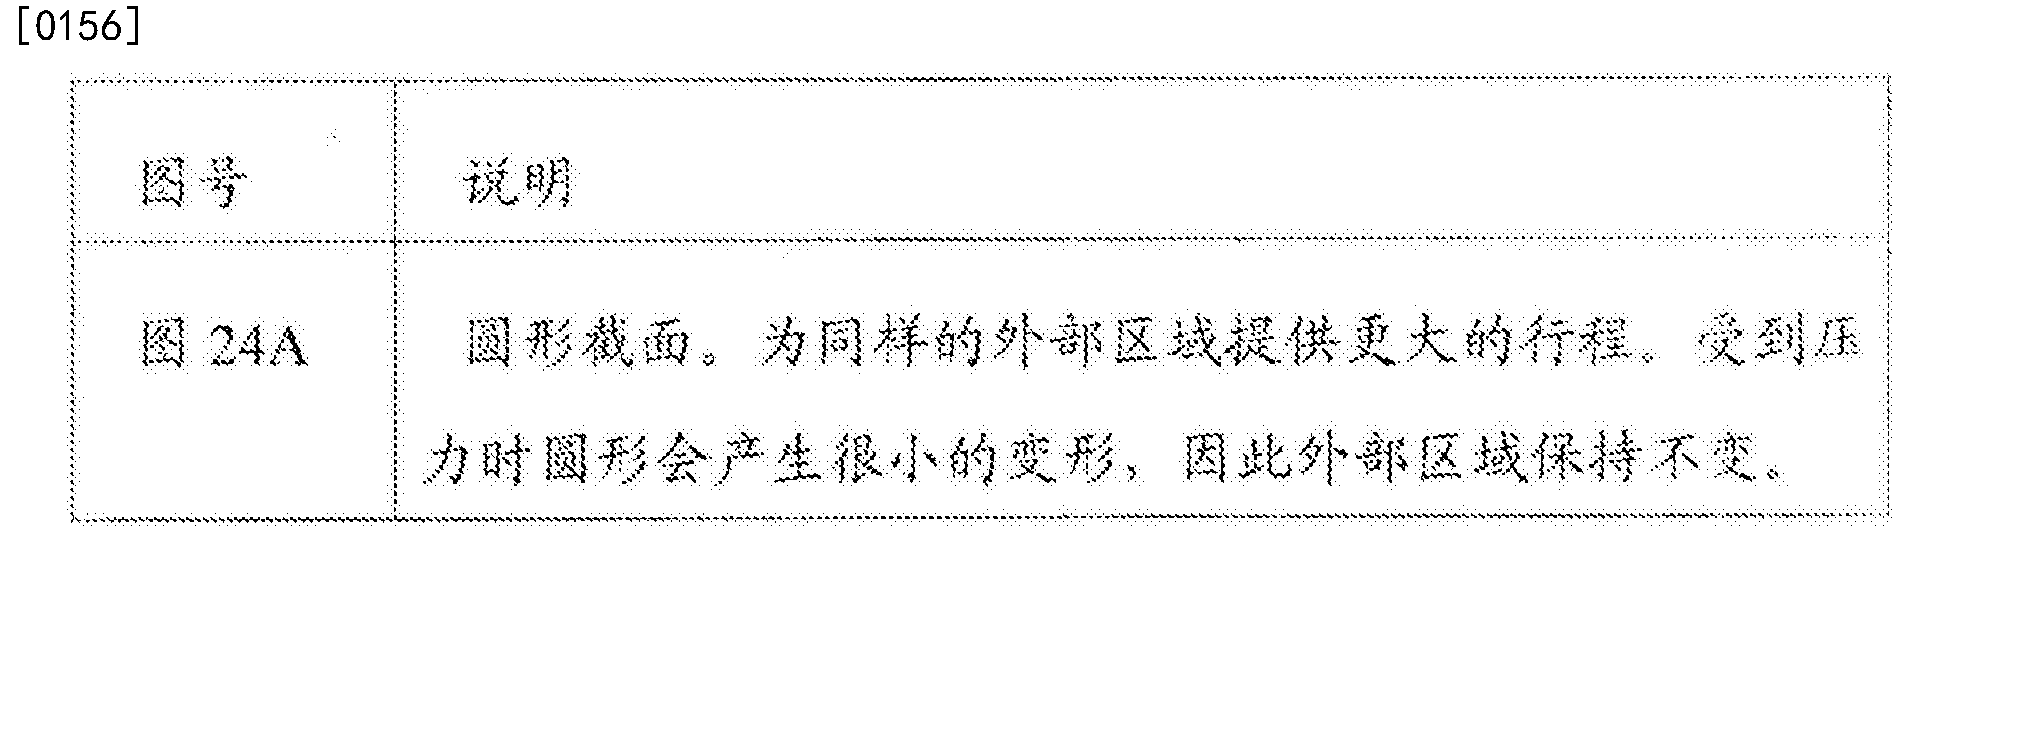 Figure CN106110464AD00211